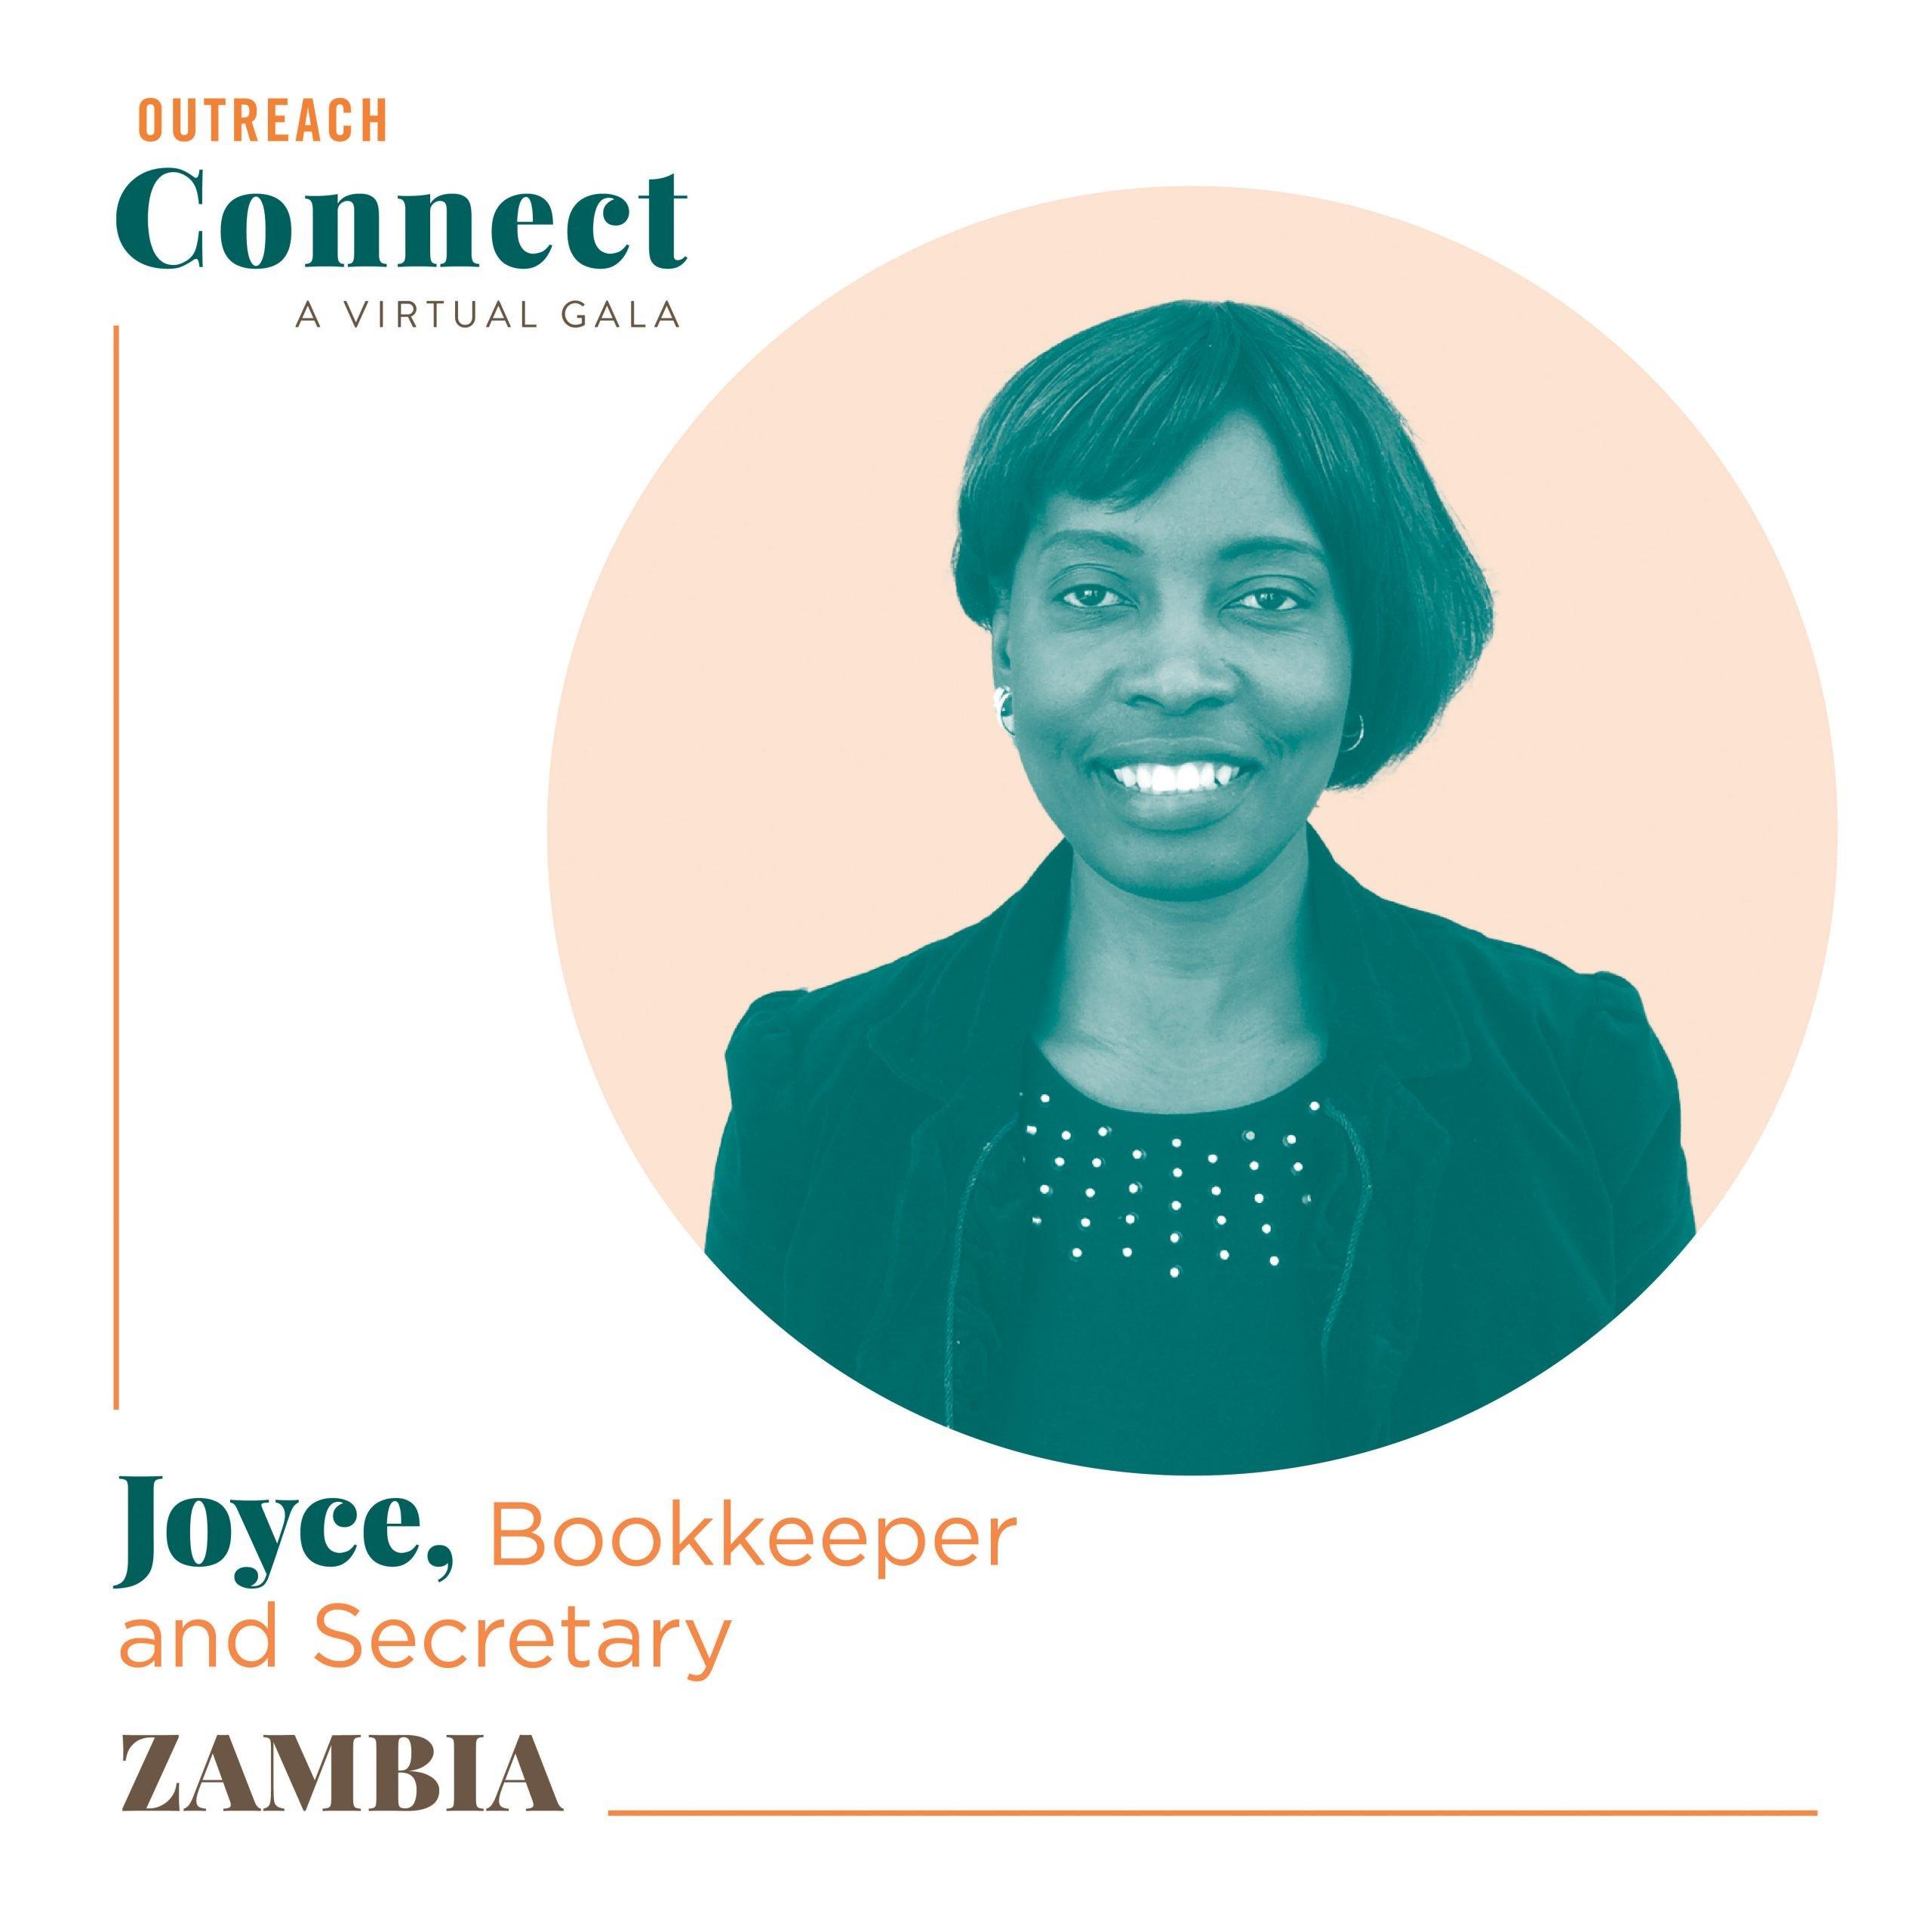 Joyce, an Outreach HDF from Zambia